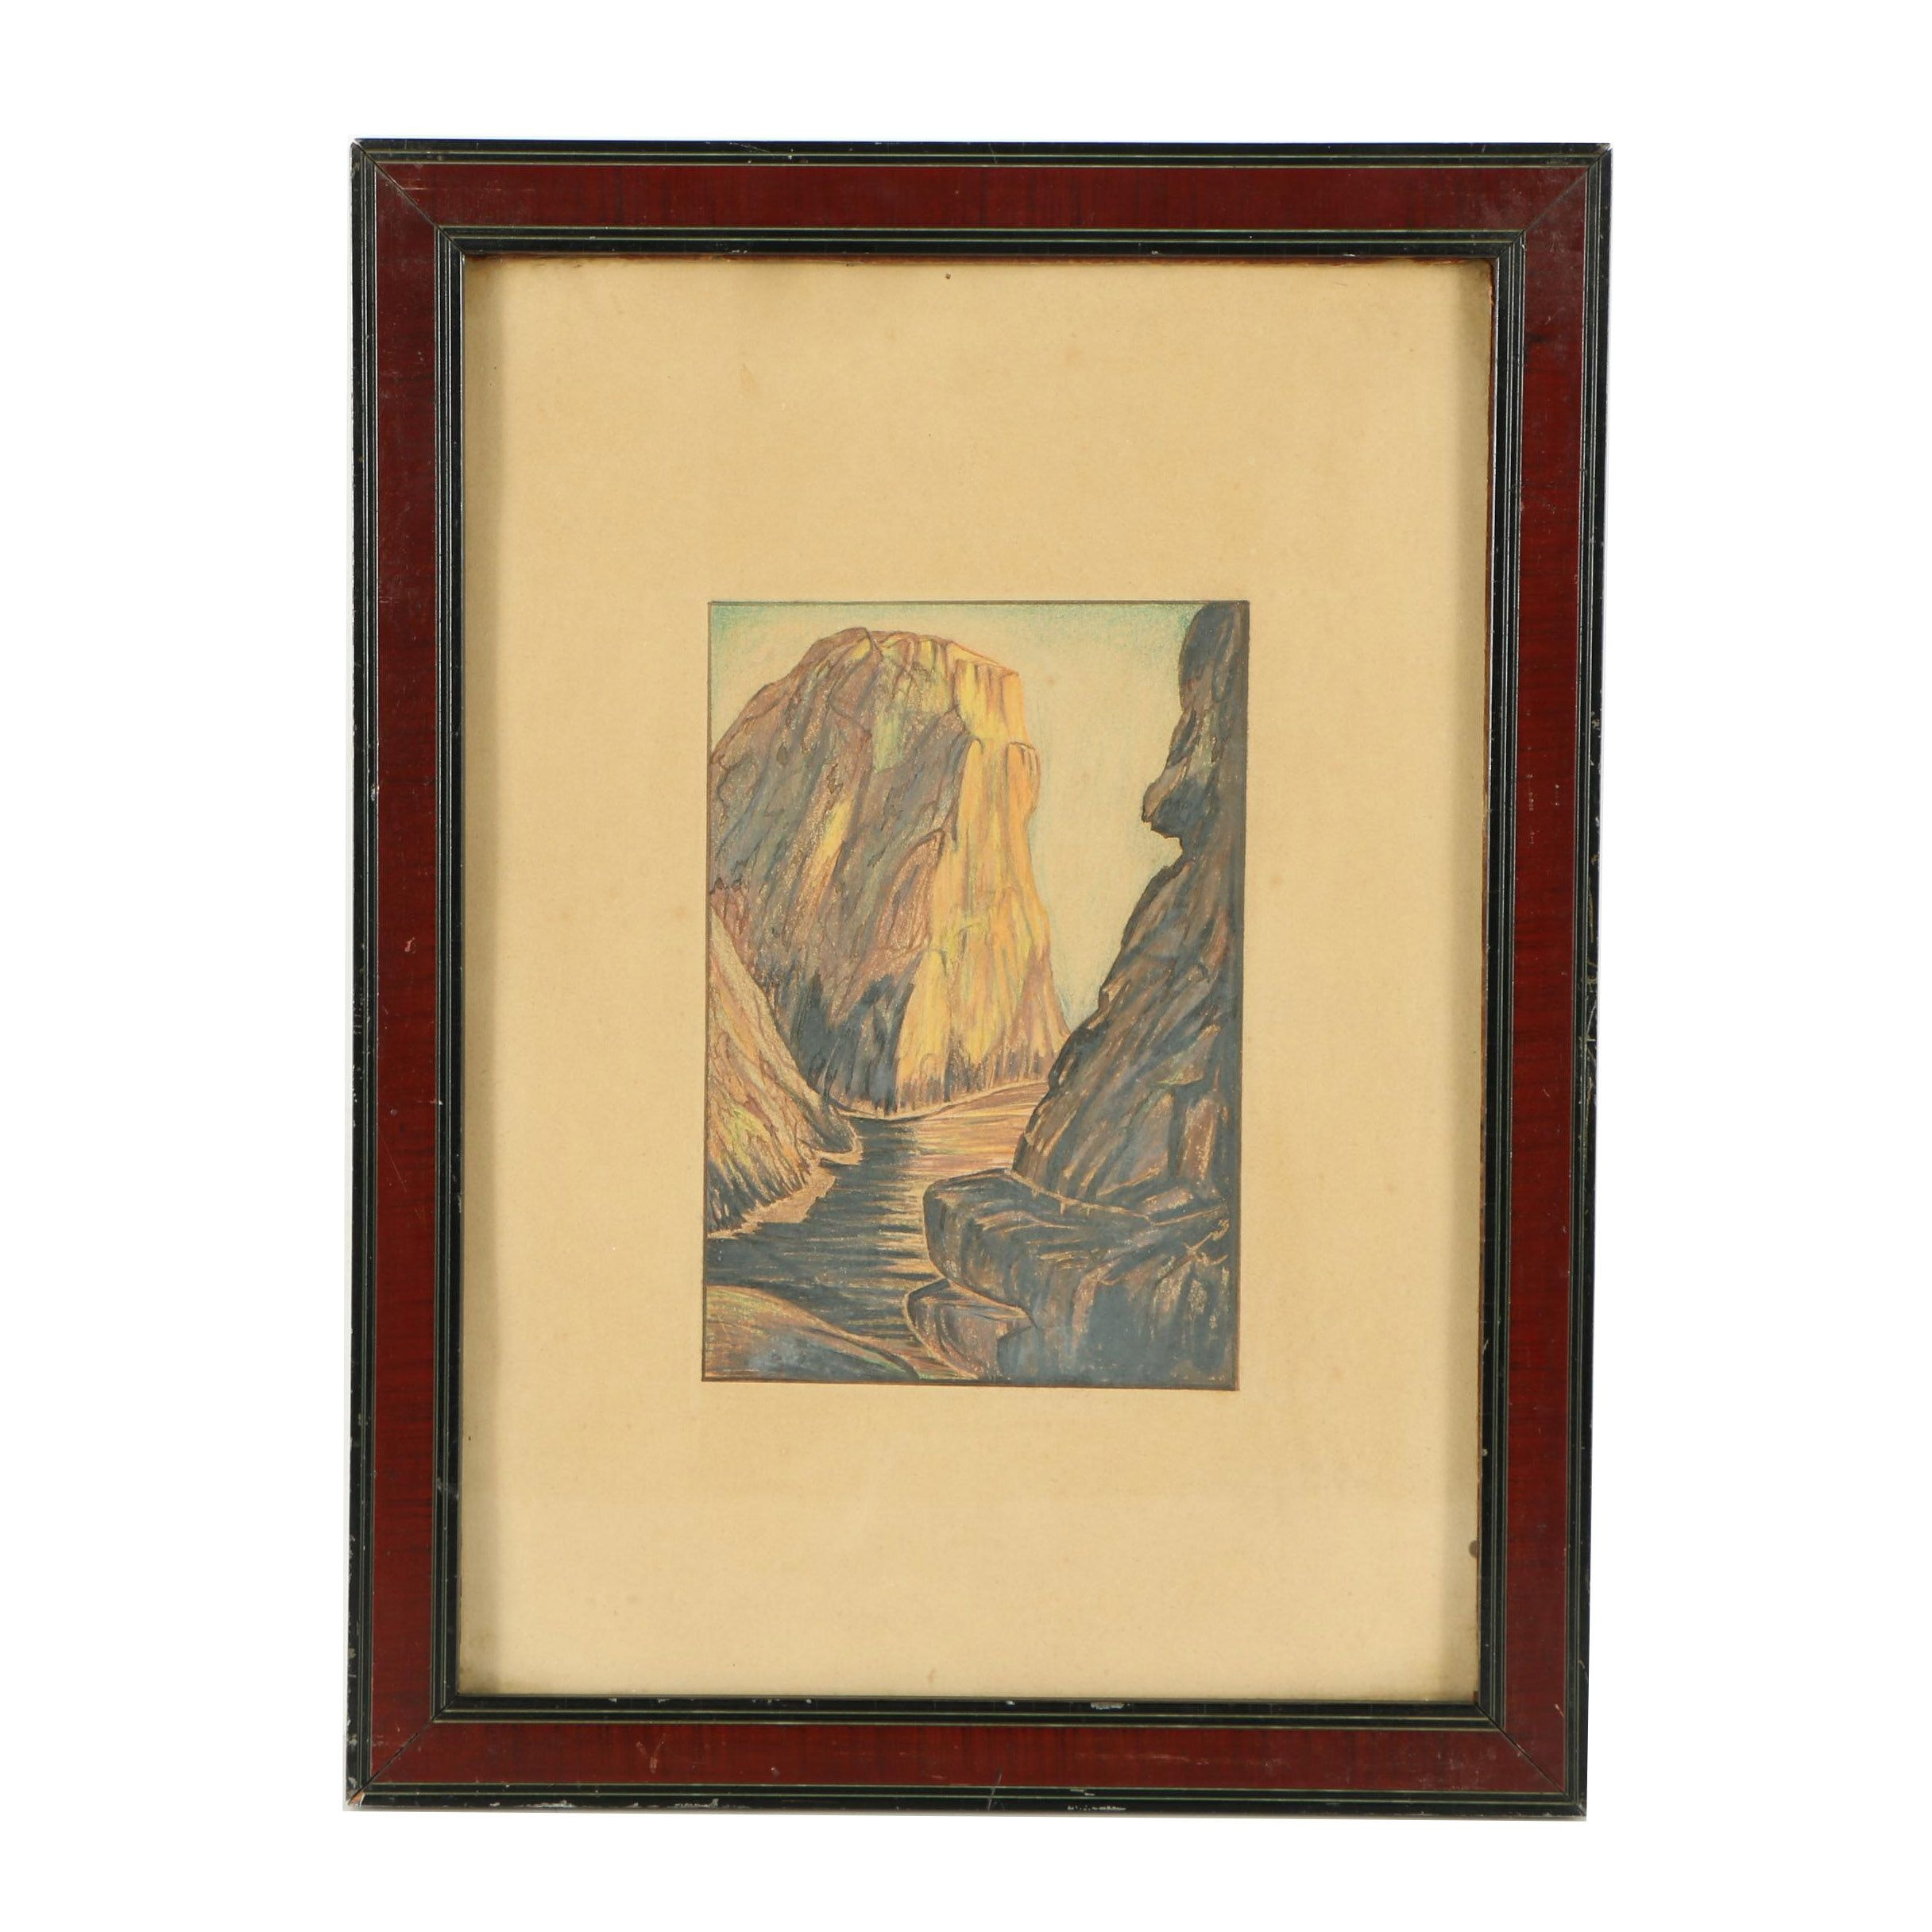 Pastel Drawing of Canyon